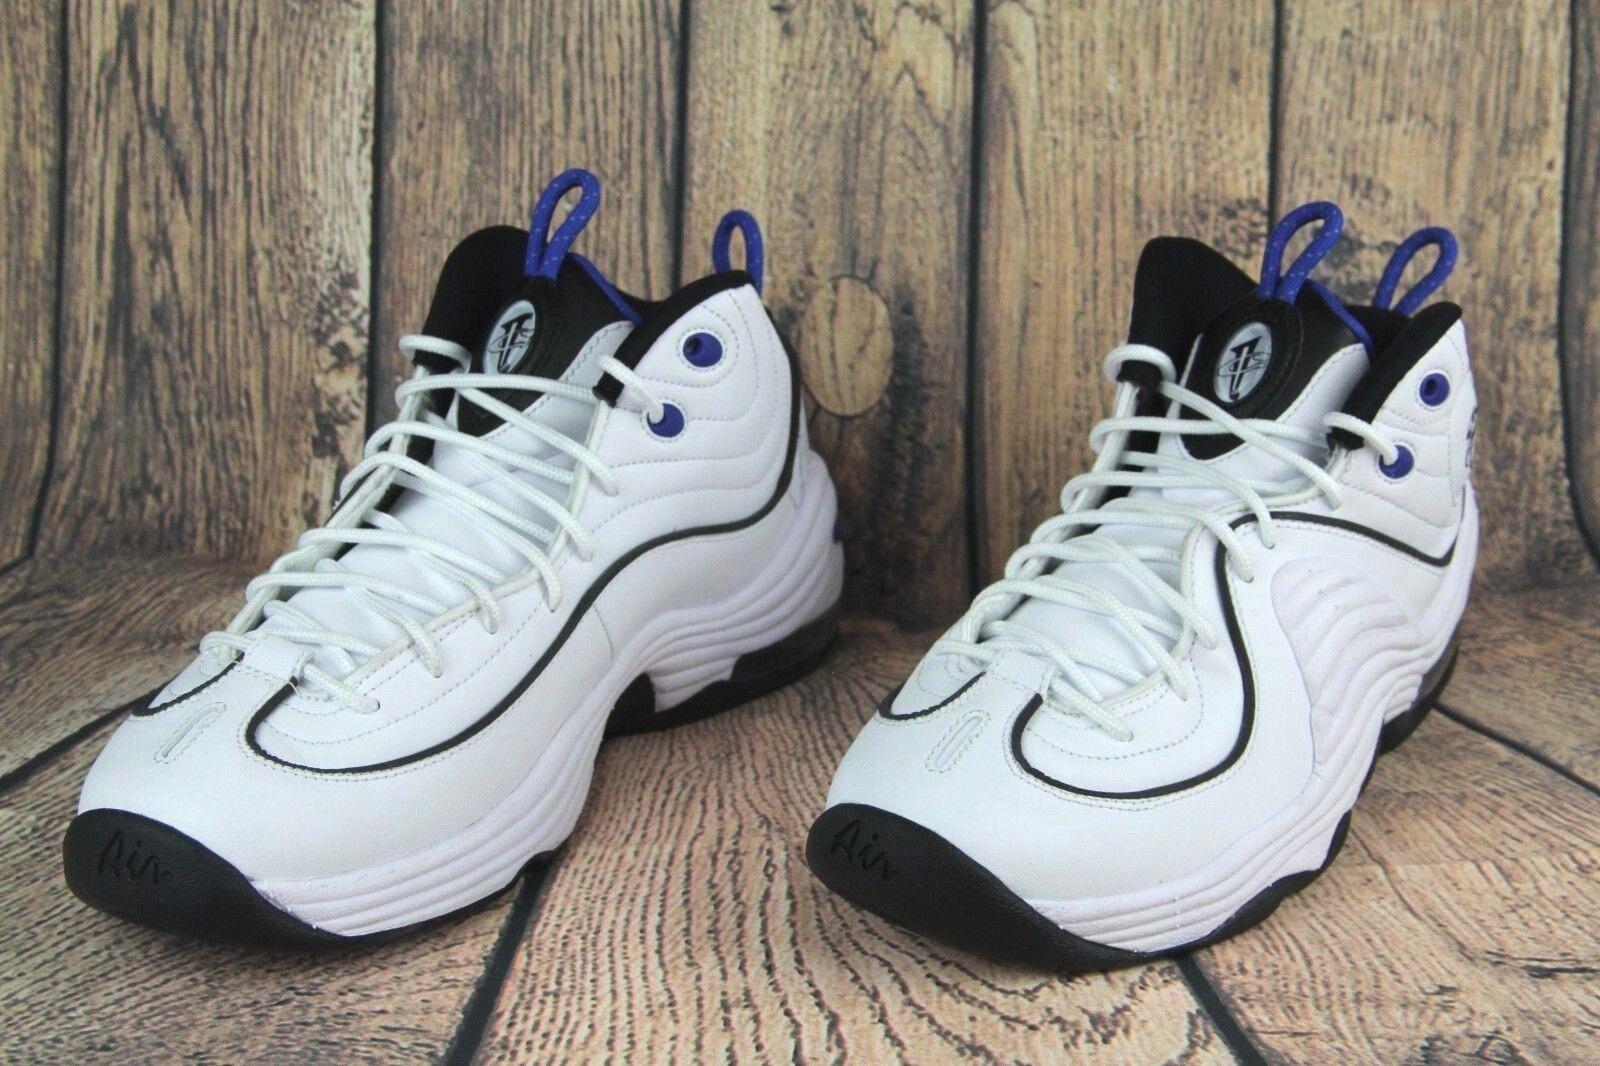 Nike Penny II Basketball shoes White Black Royal blueee 333886-100 SZ NEW